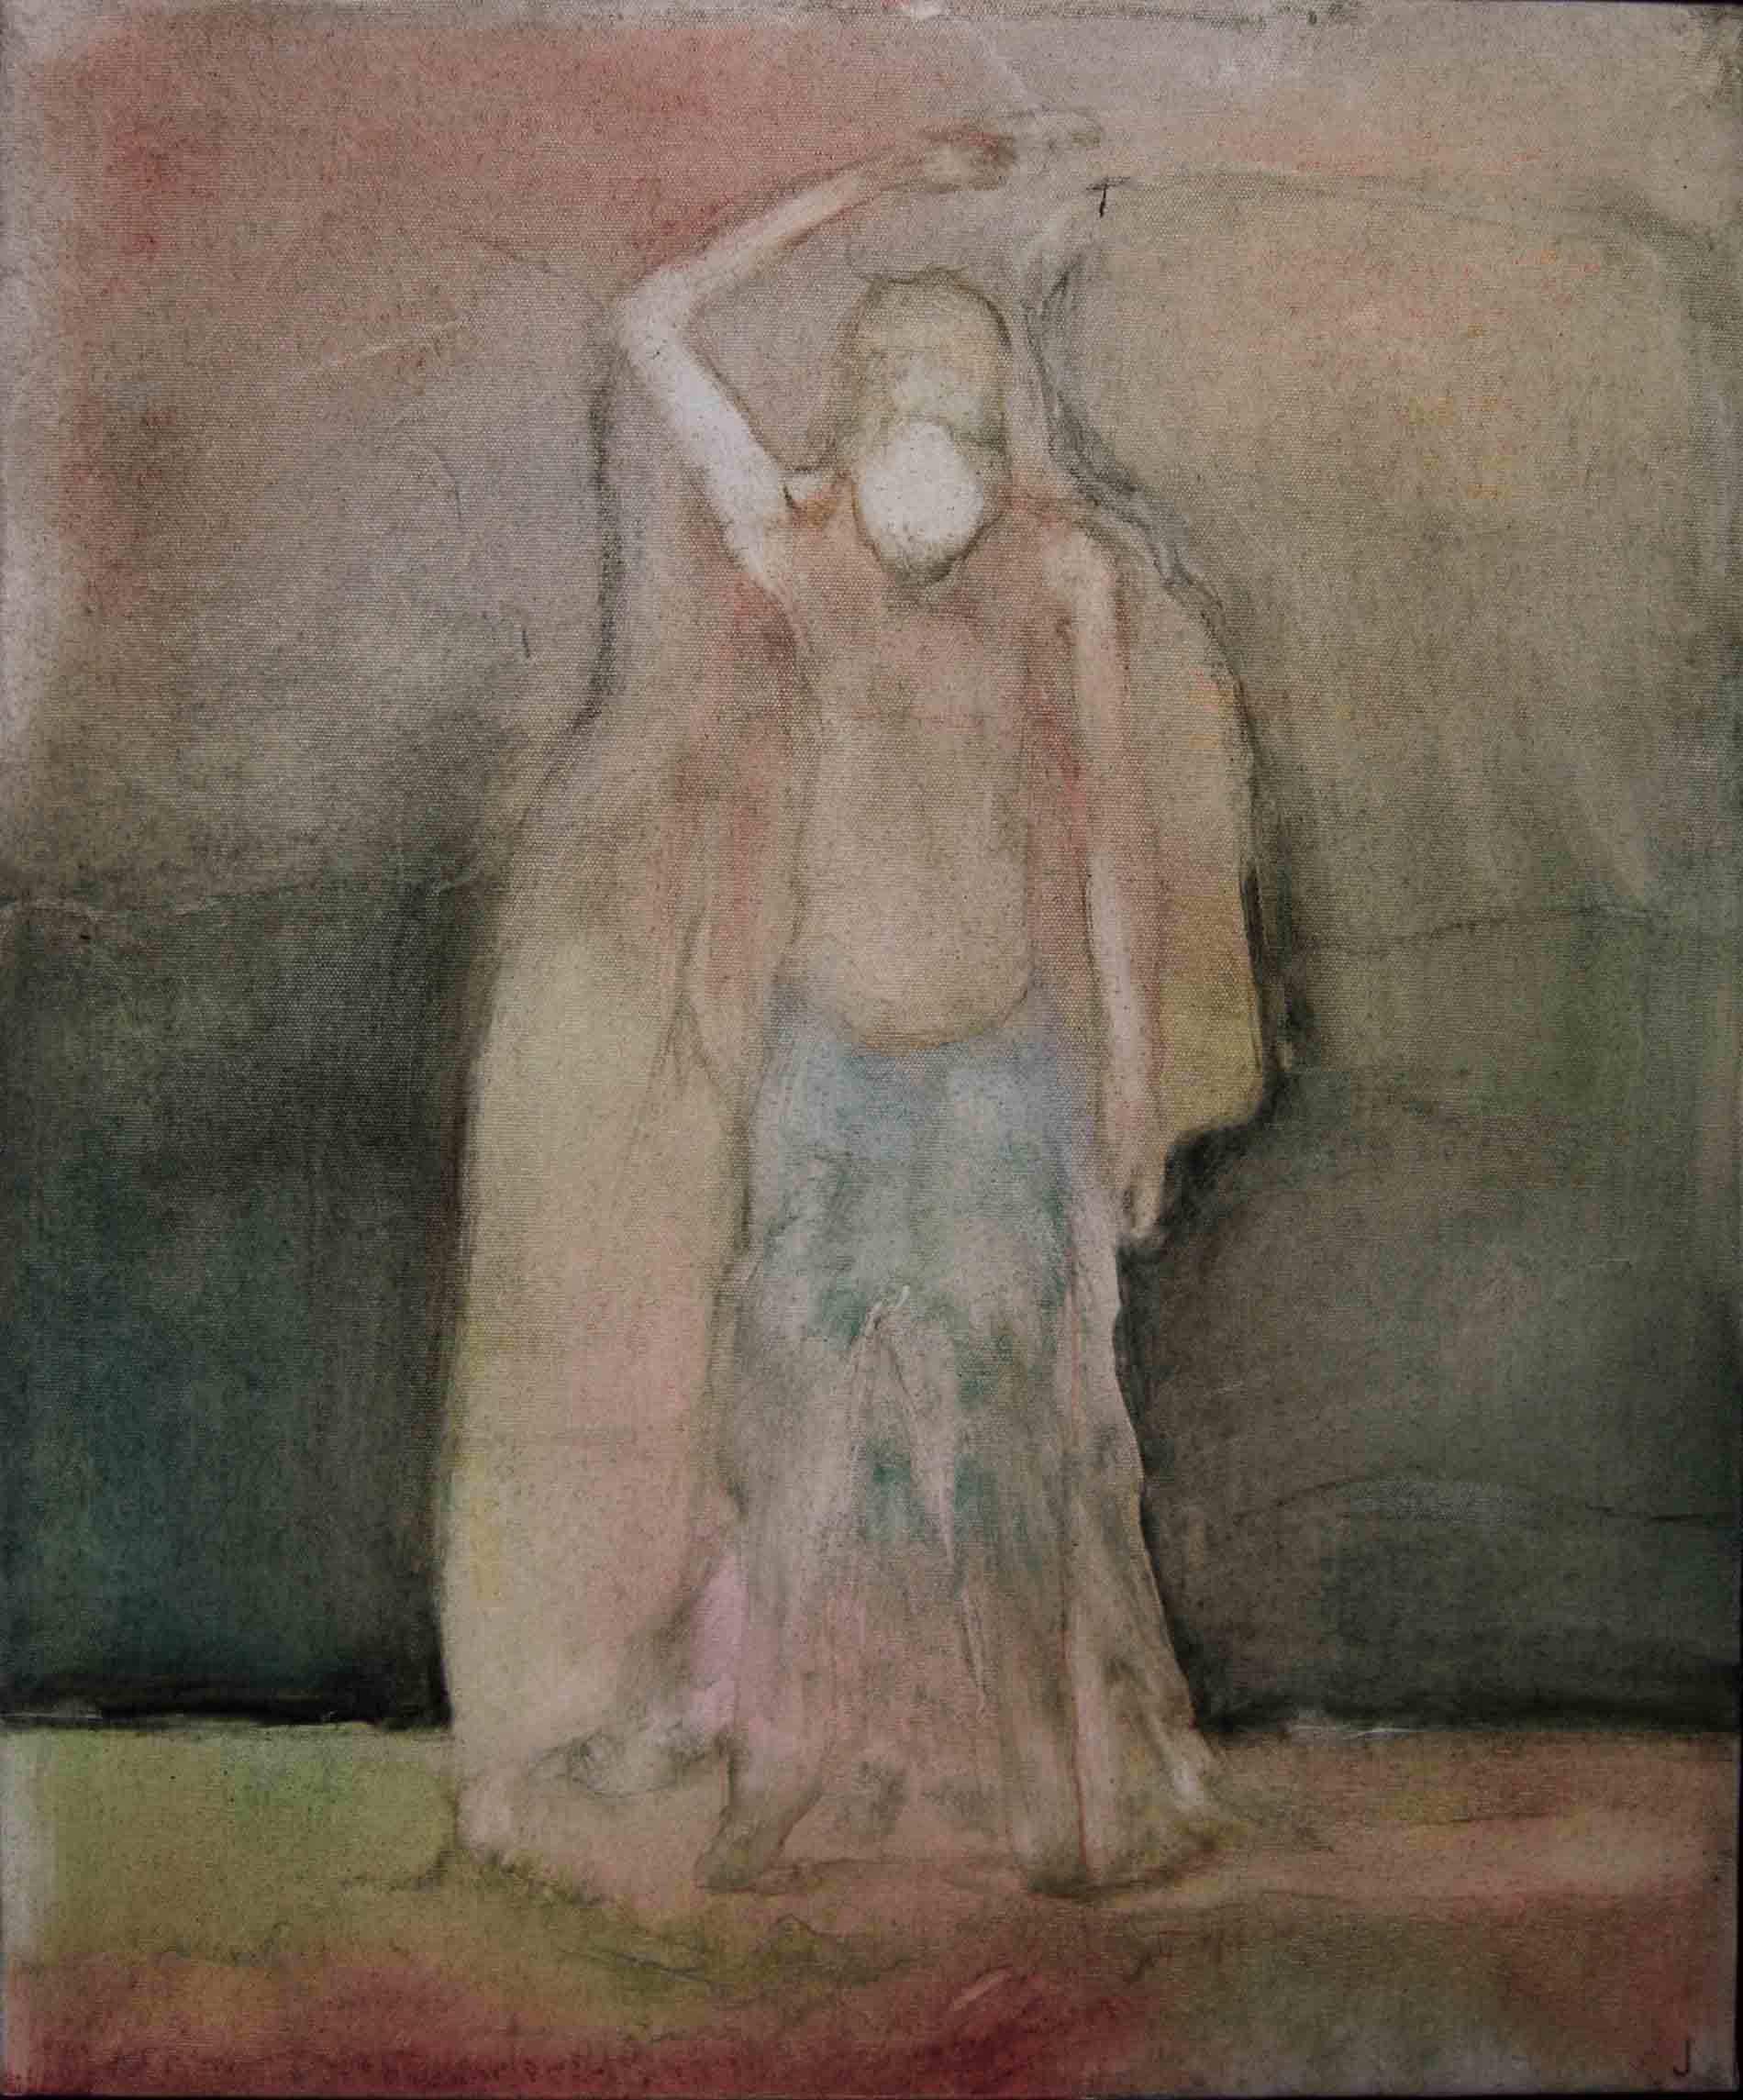 Justin Williams, Samsara , 2014, oil and raw pigments on canvas, 63 x 52cm